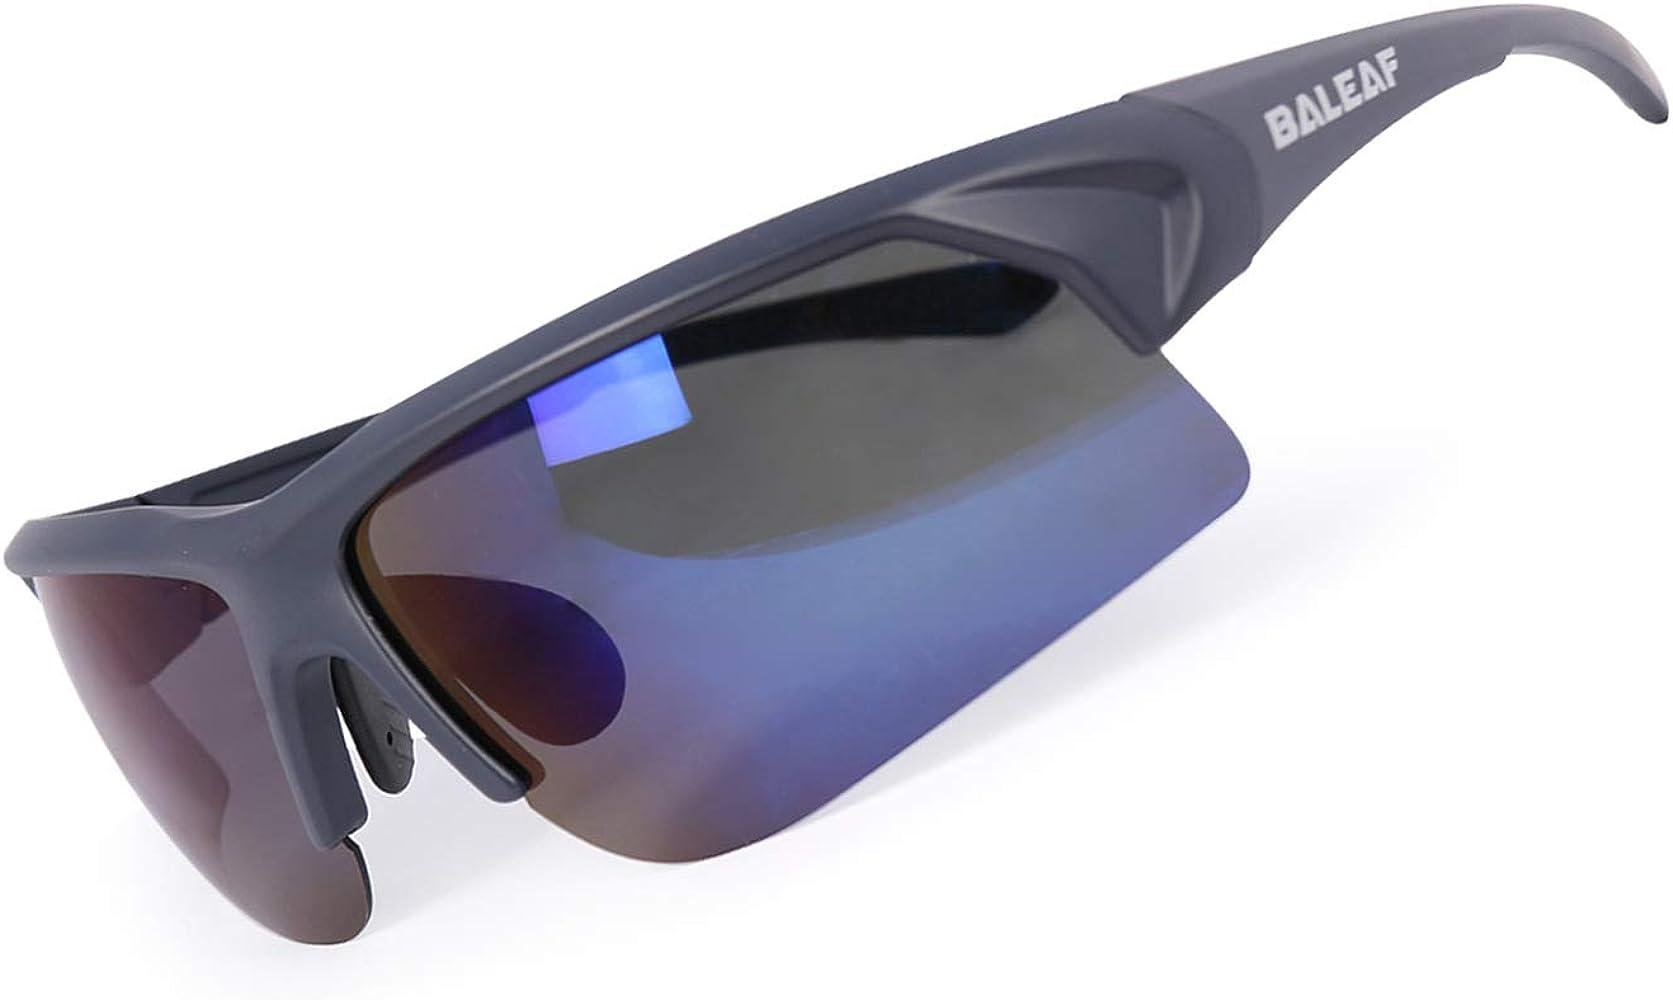 Amazon.com: BALEAF Superlight Polarized Sports Sunglasses Tr90 Cycling Bike  Eyewear with Adjustable Nose Piece for Men Women Blue Revo: Clothing